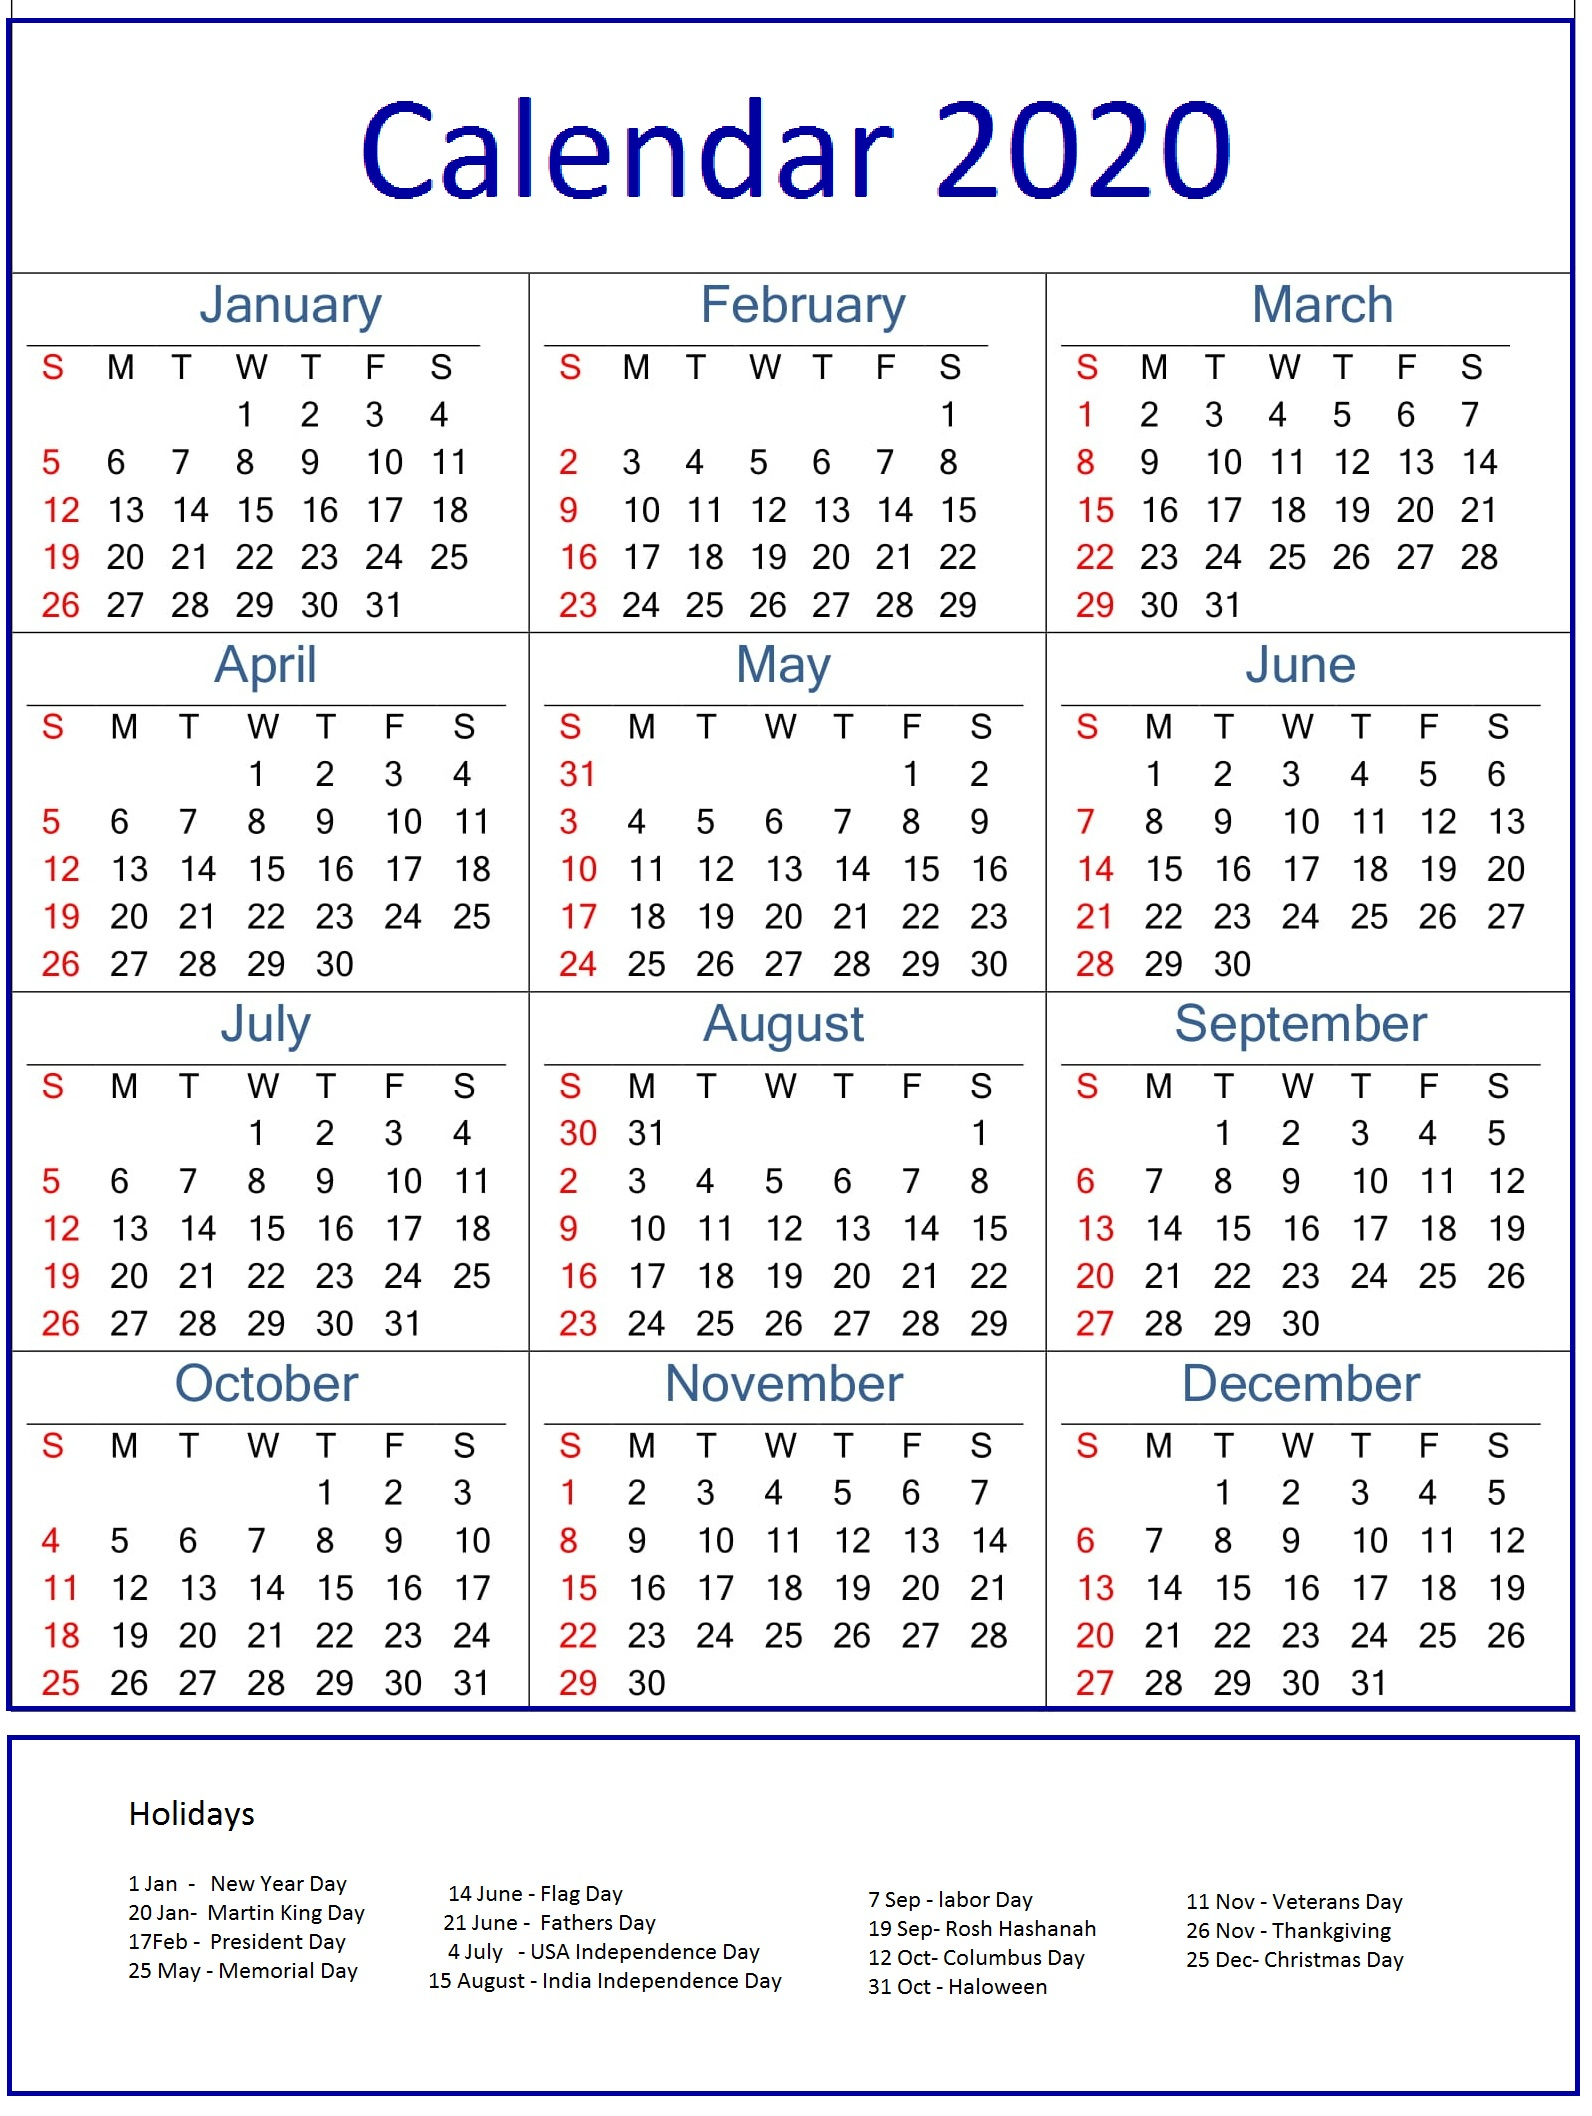 Monthly Calendar Holidays 2020 | Calendar Ideas Design Creative